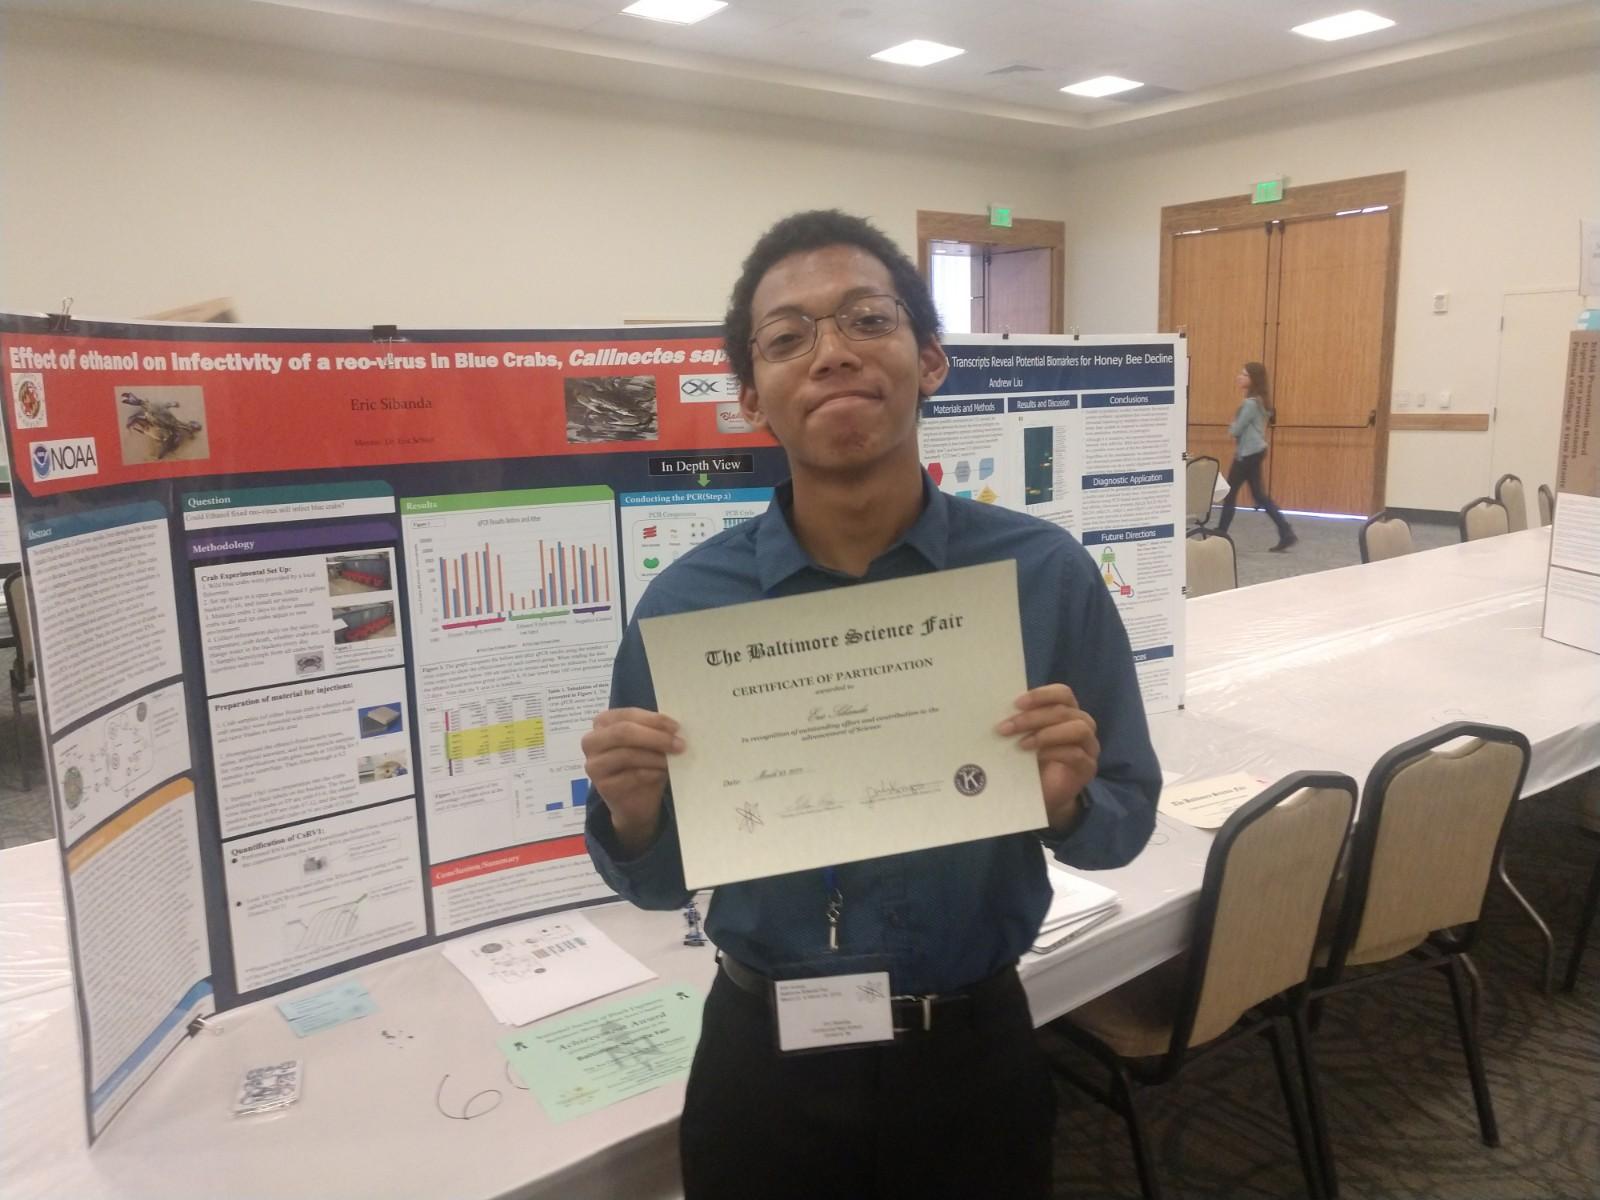 Eric Sibanda holds up science fair certificate